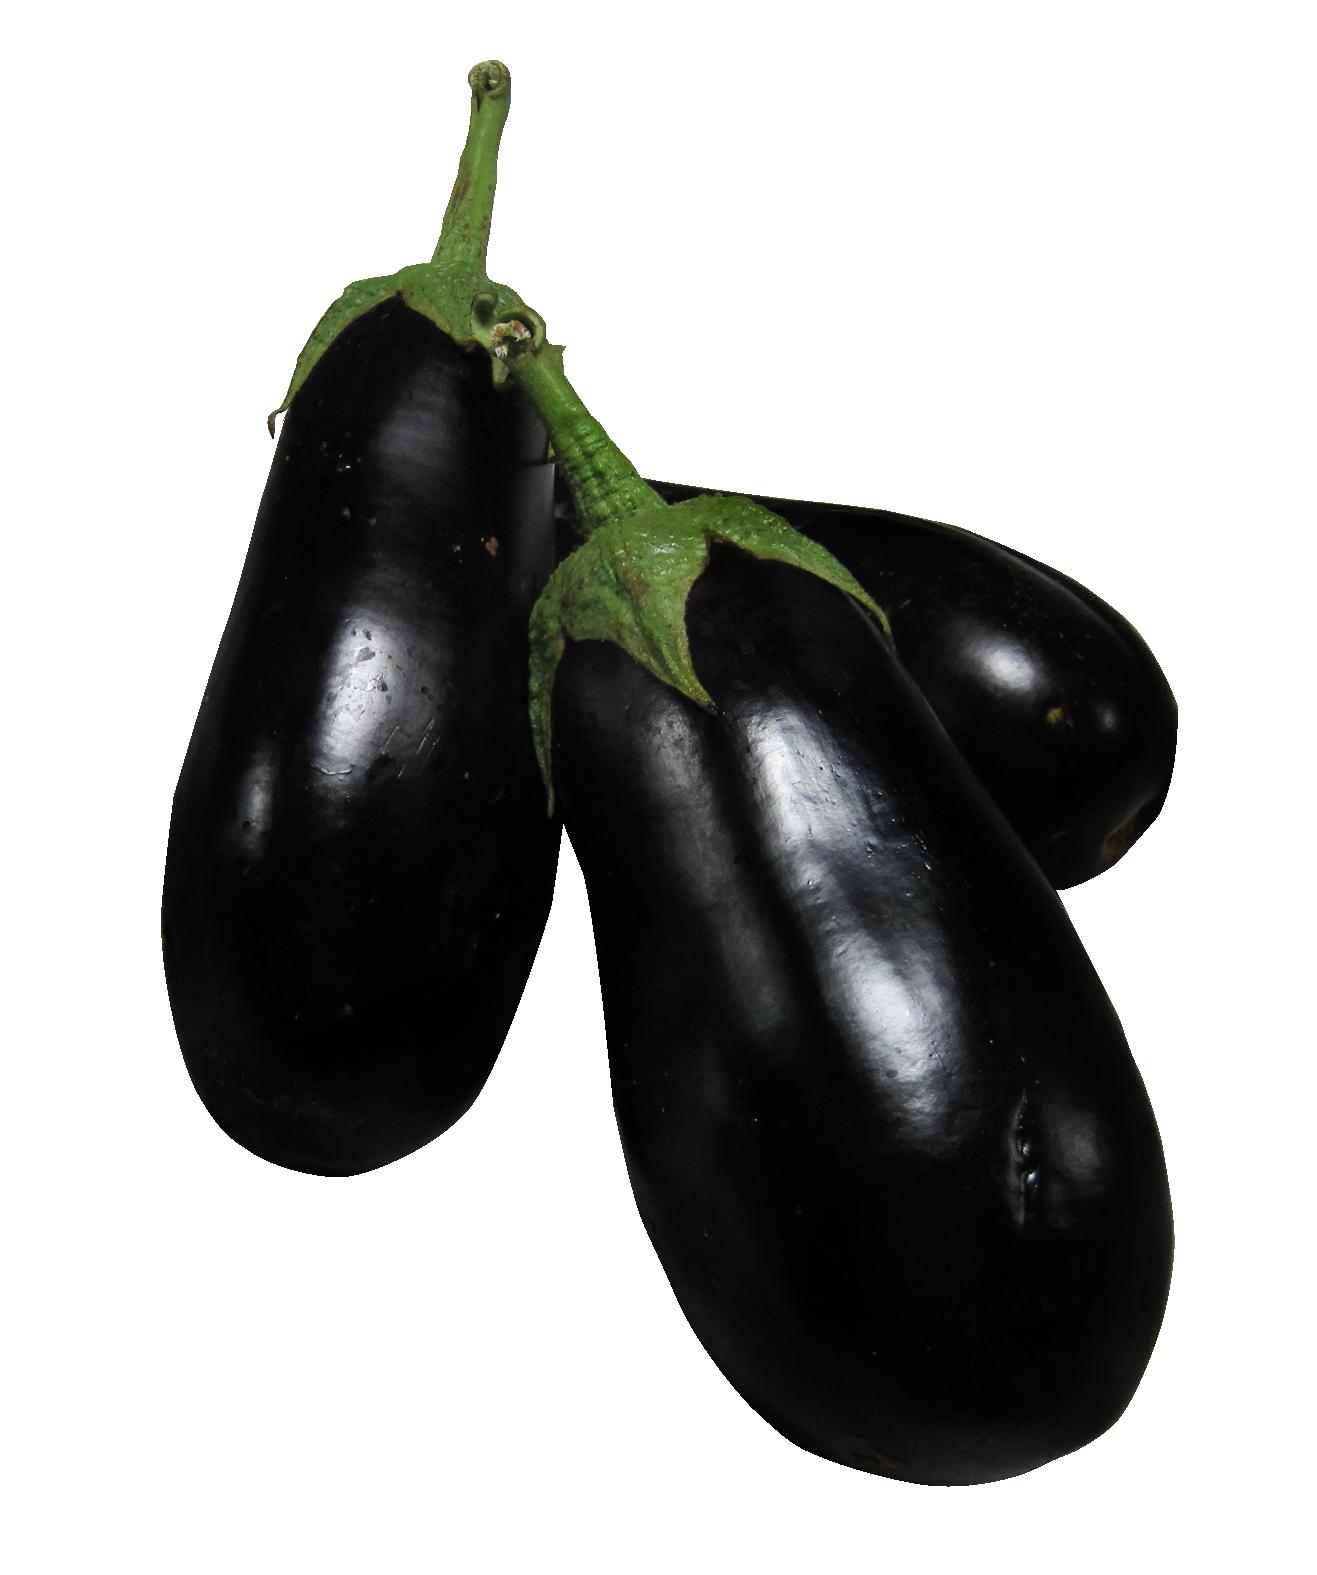 Eggplant PNG Image